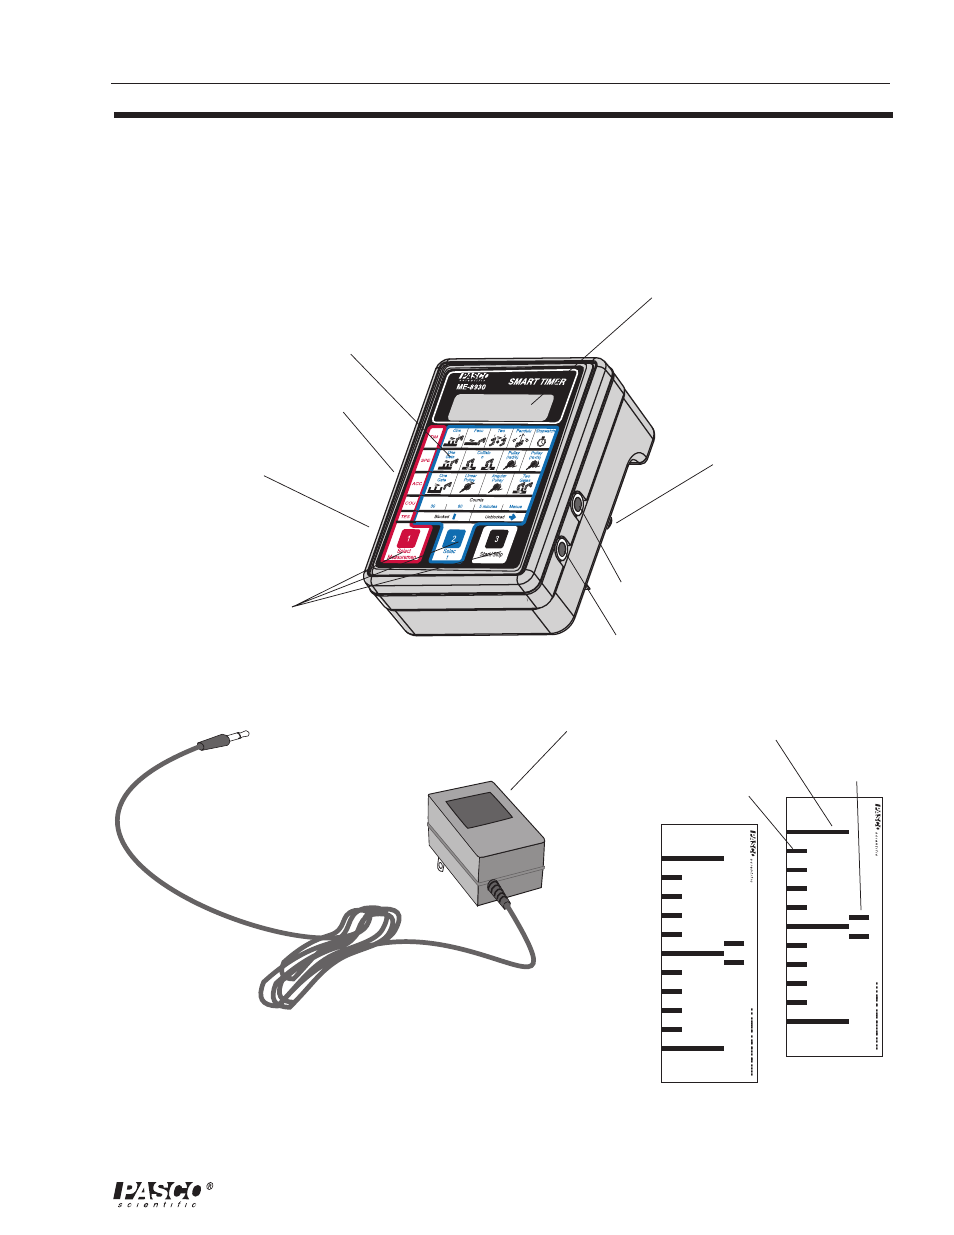 equipment  figure 1